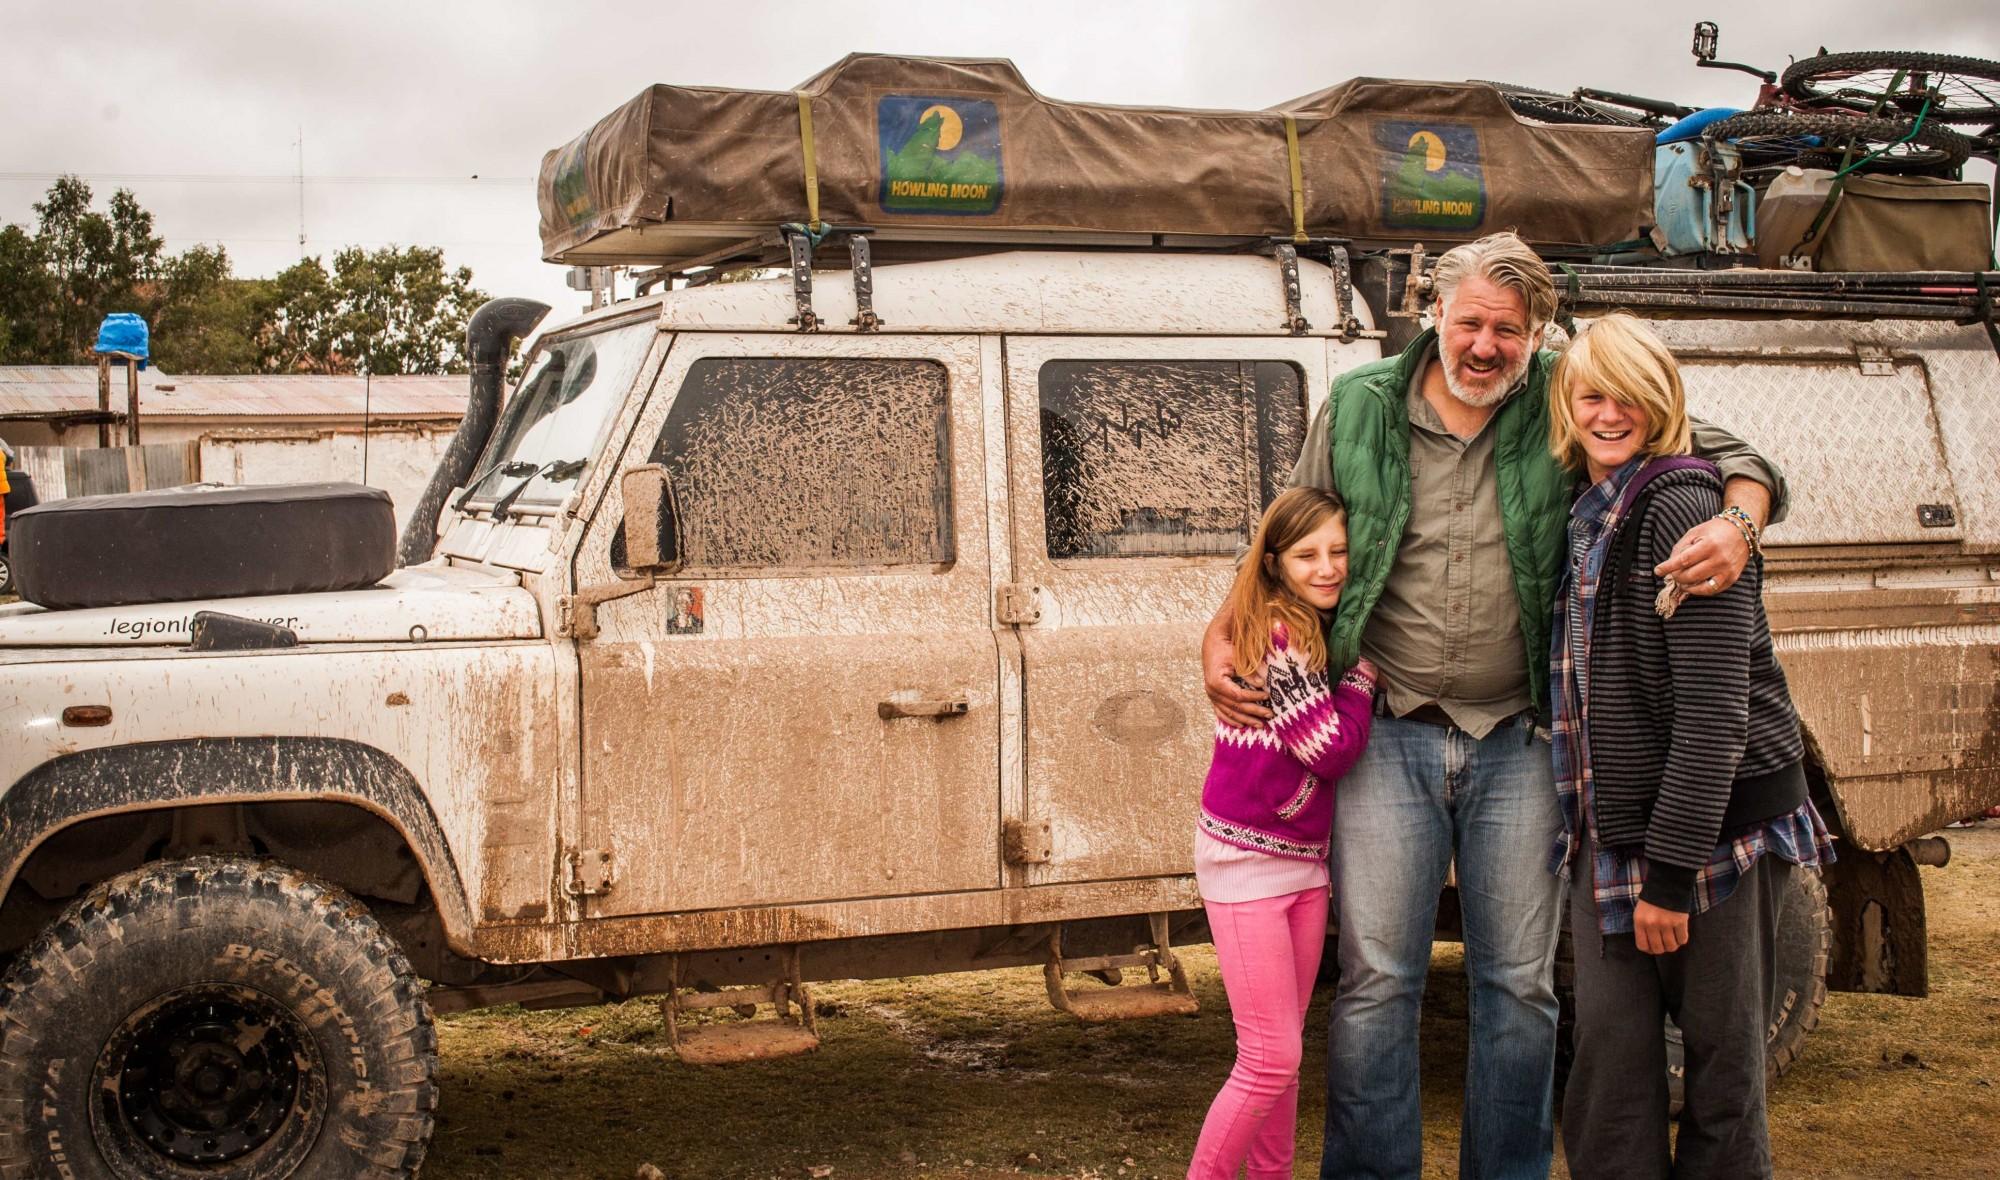 Jessica, Graeme and Keelan, Bolivia. 2015